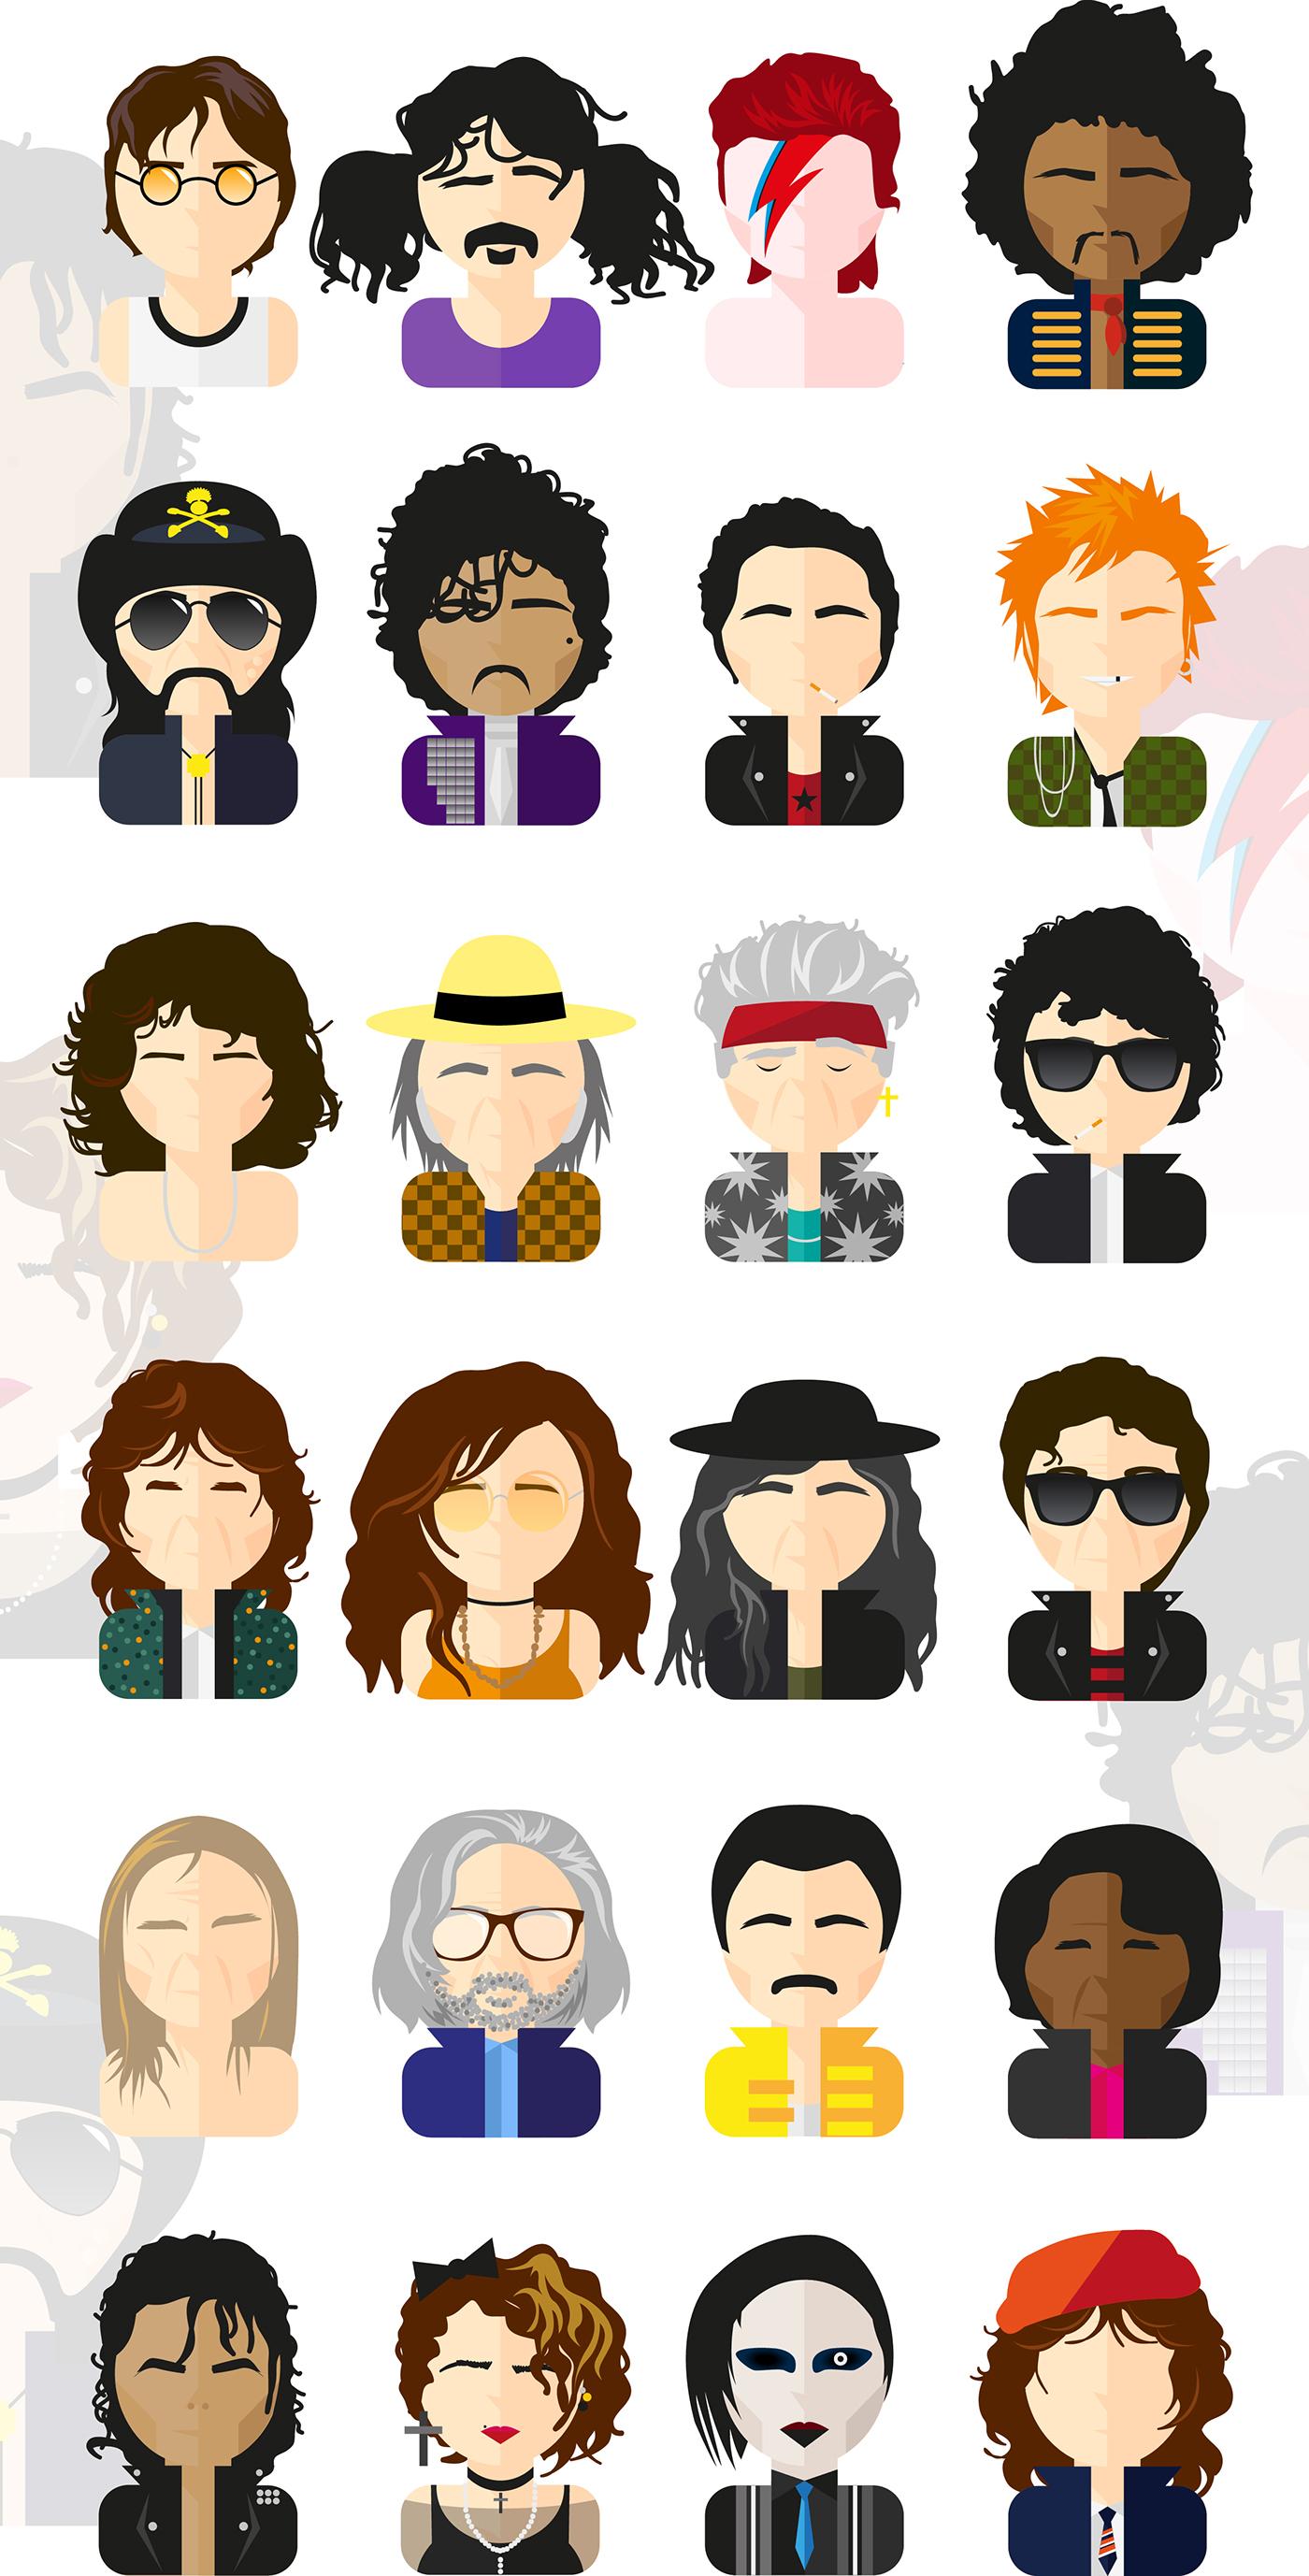 rock game Michael Jackson neil young Freddie Mercury James Brown Frank Zappa Keith Richards madonna John Lennon Jimi Hendrix bob dylan prince david bowie